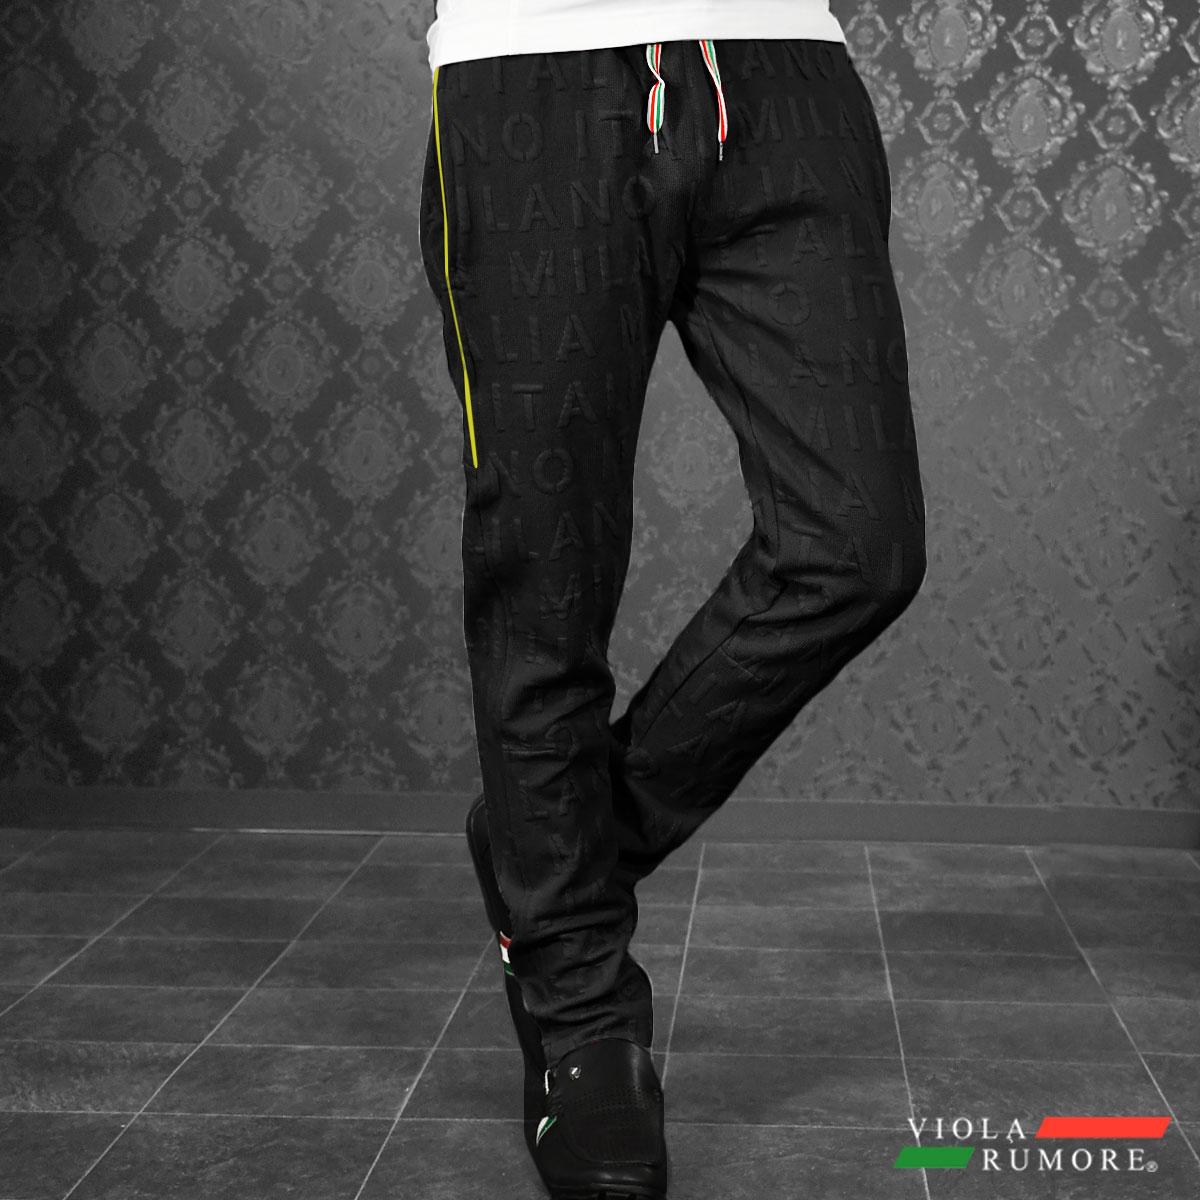 VIOLA rumore ヴィオラ ビオラ スウェットパンツ ニット ジャガード ロゴ 無地 英字 ロングパンツ メンズ(ブラック黒) 91136